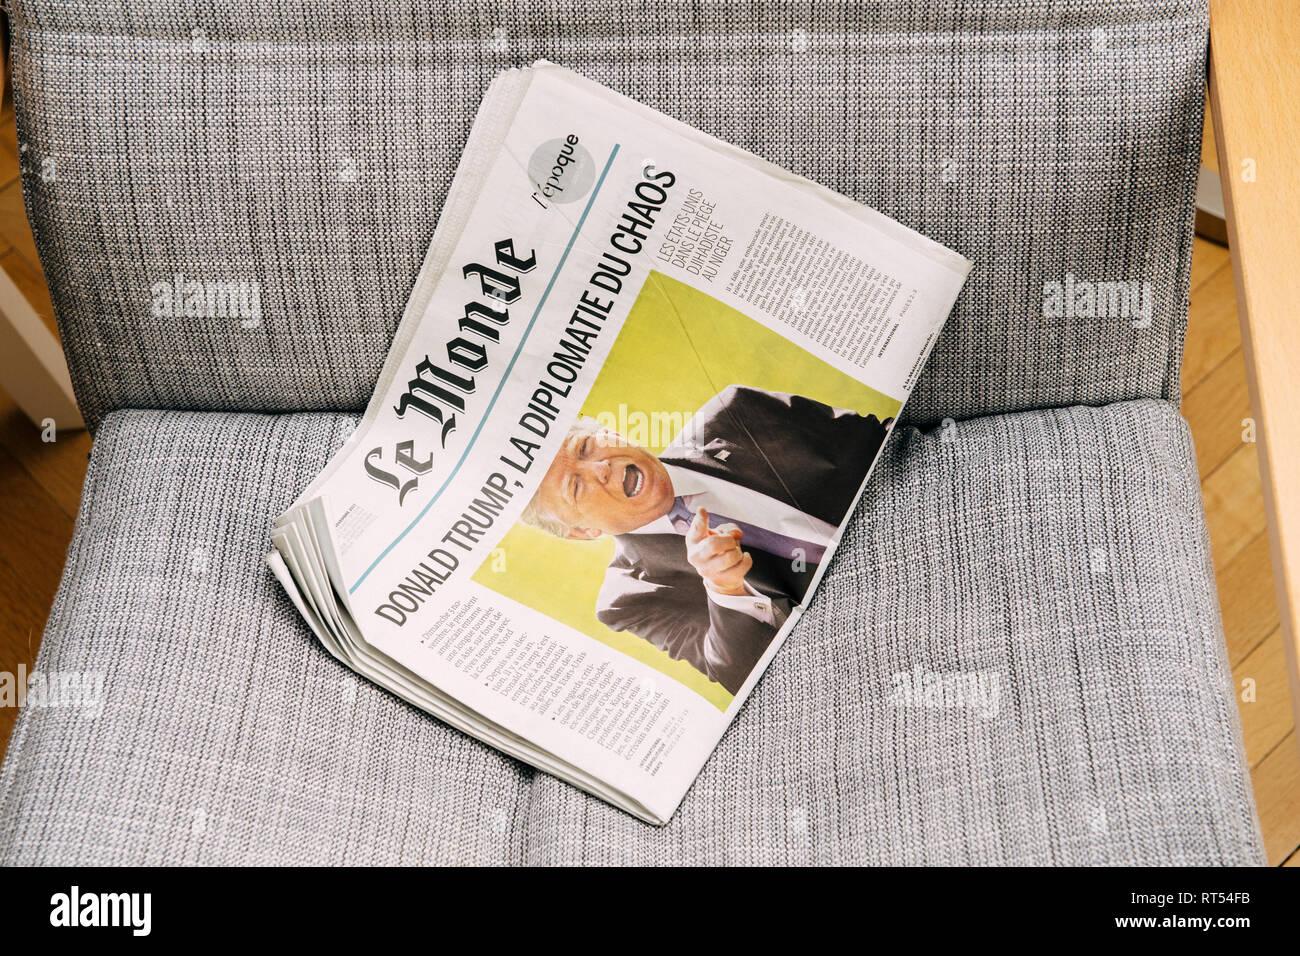 PARIS, FRANCE - NOV 6, 2017: Armchair background latest Le Monde newspaper featuring headline Donald Trump is Chaos Diplomacy - Stock Image